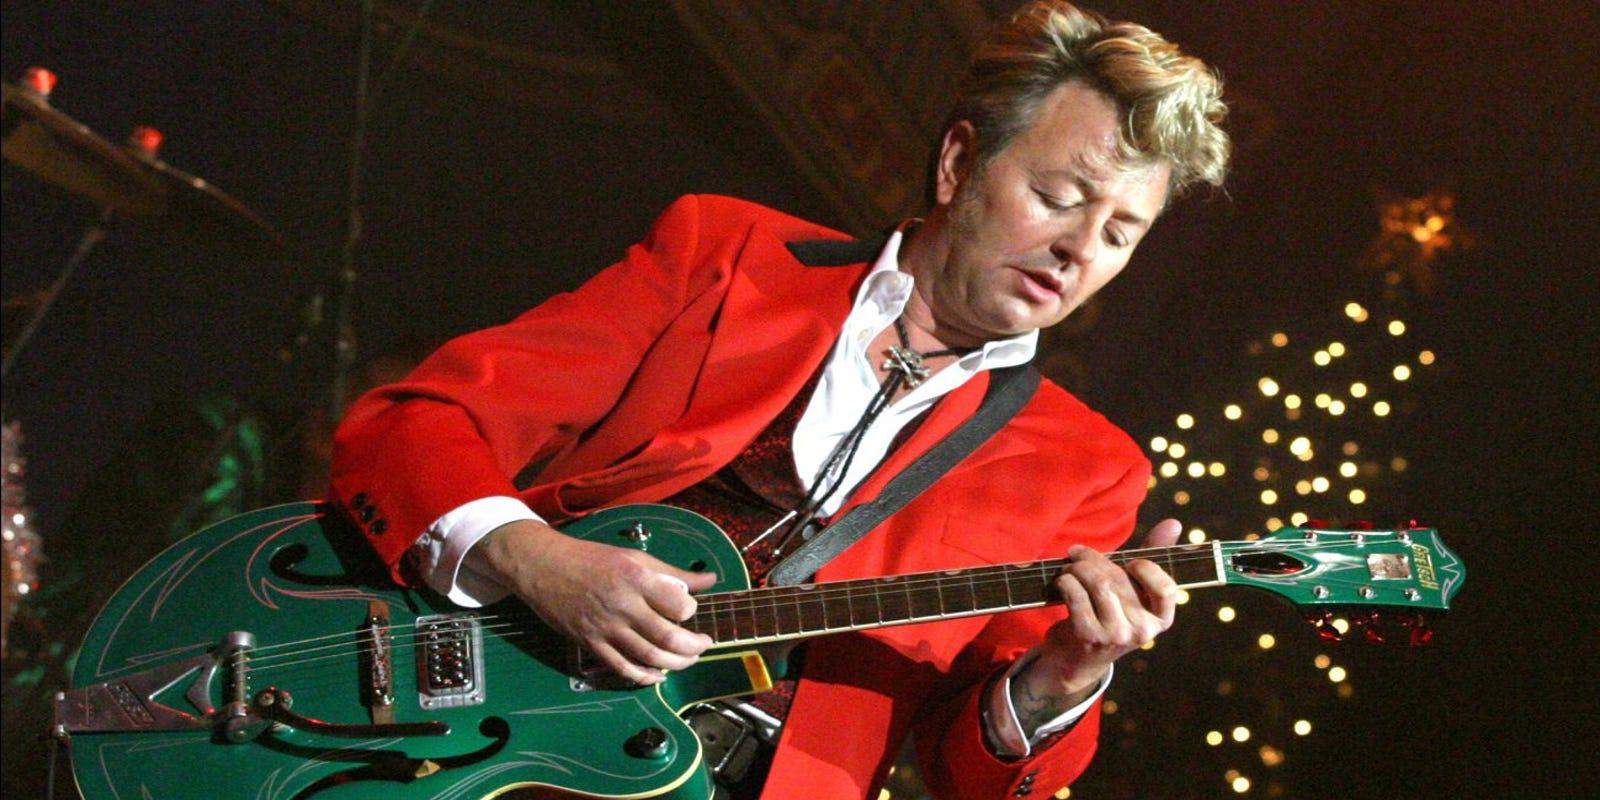 Brian Setzer Christmas.Brian Setzer Bring Christmas Rock Songs To Old Palm Springs